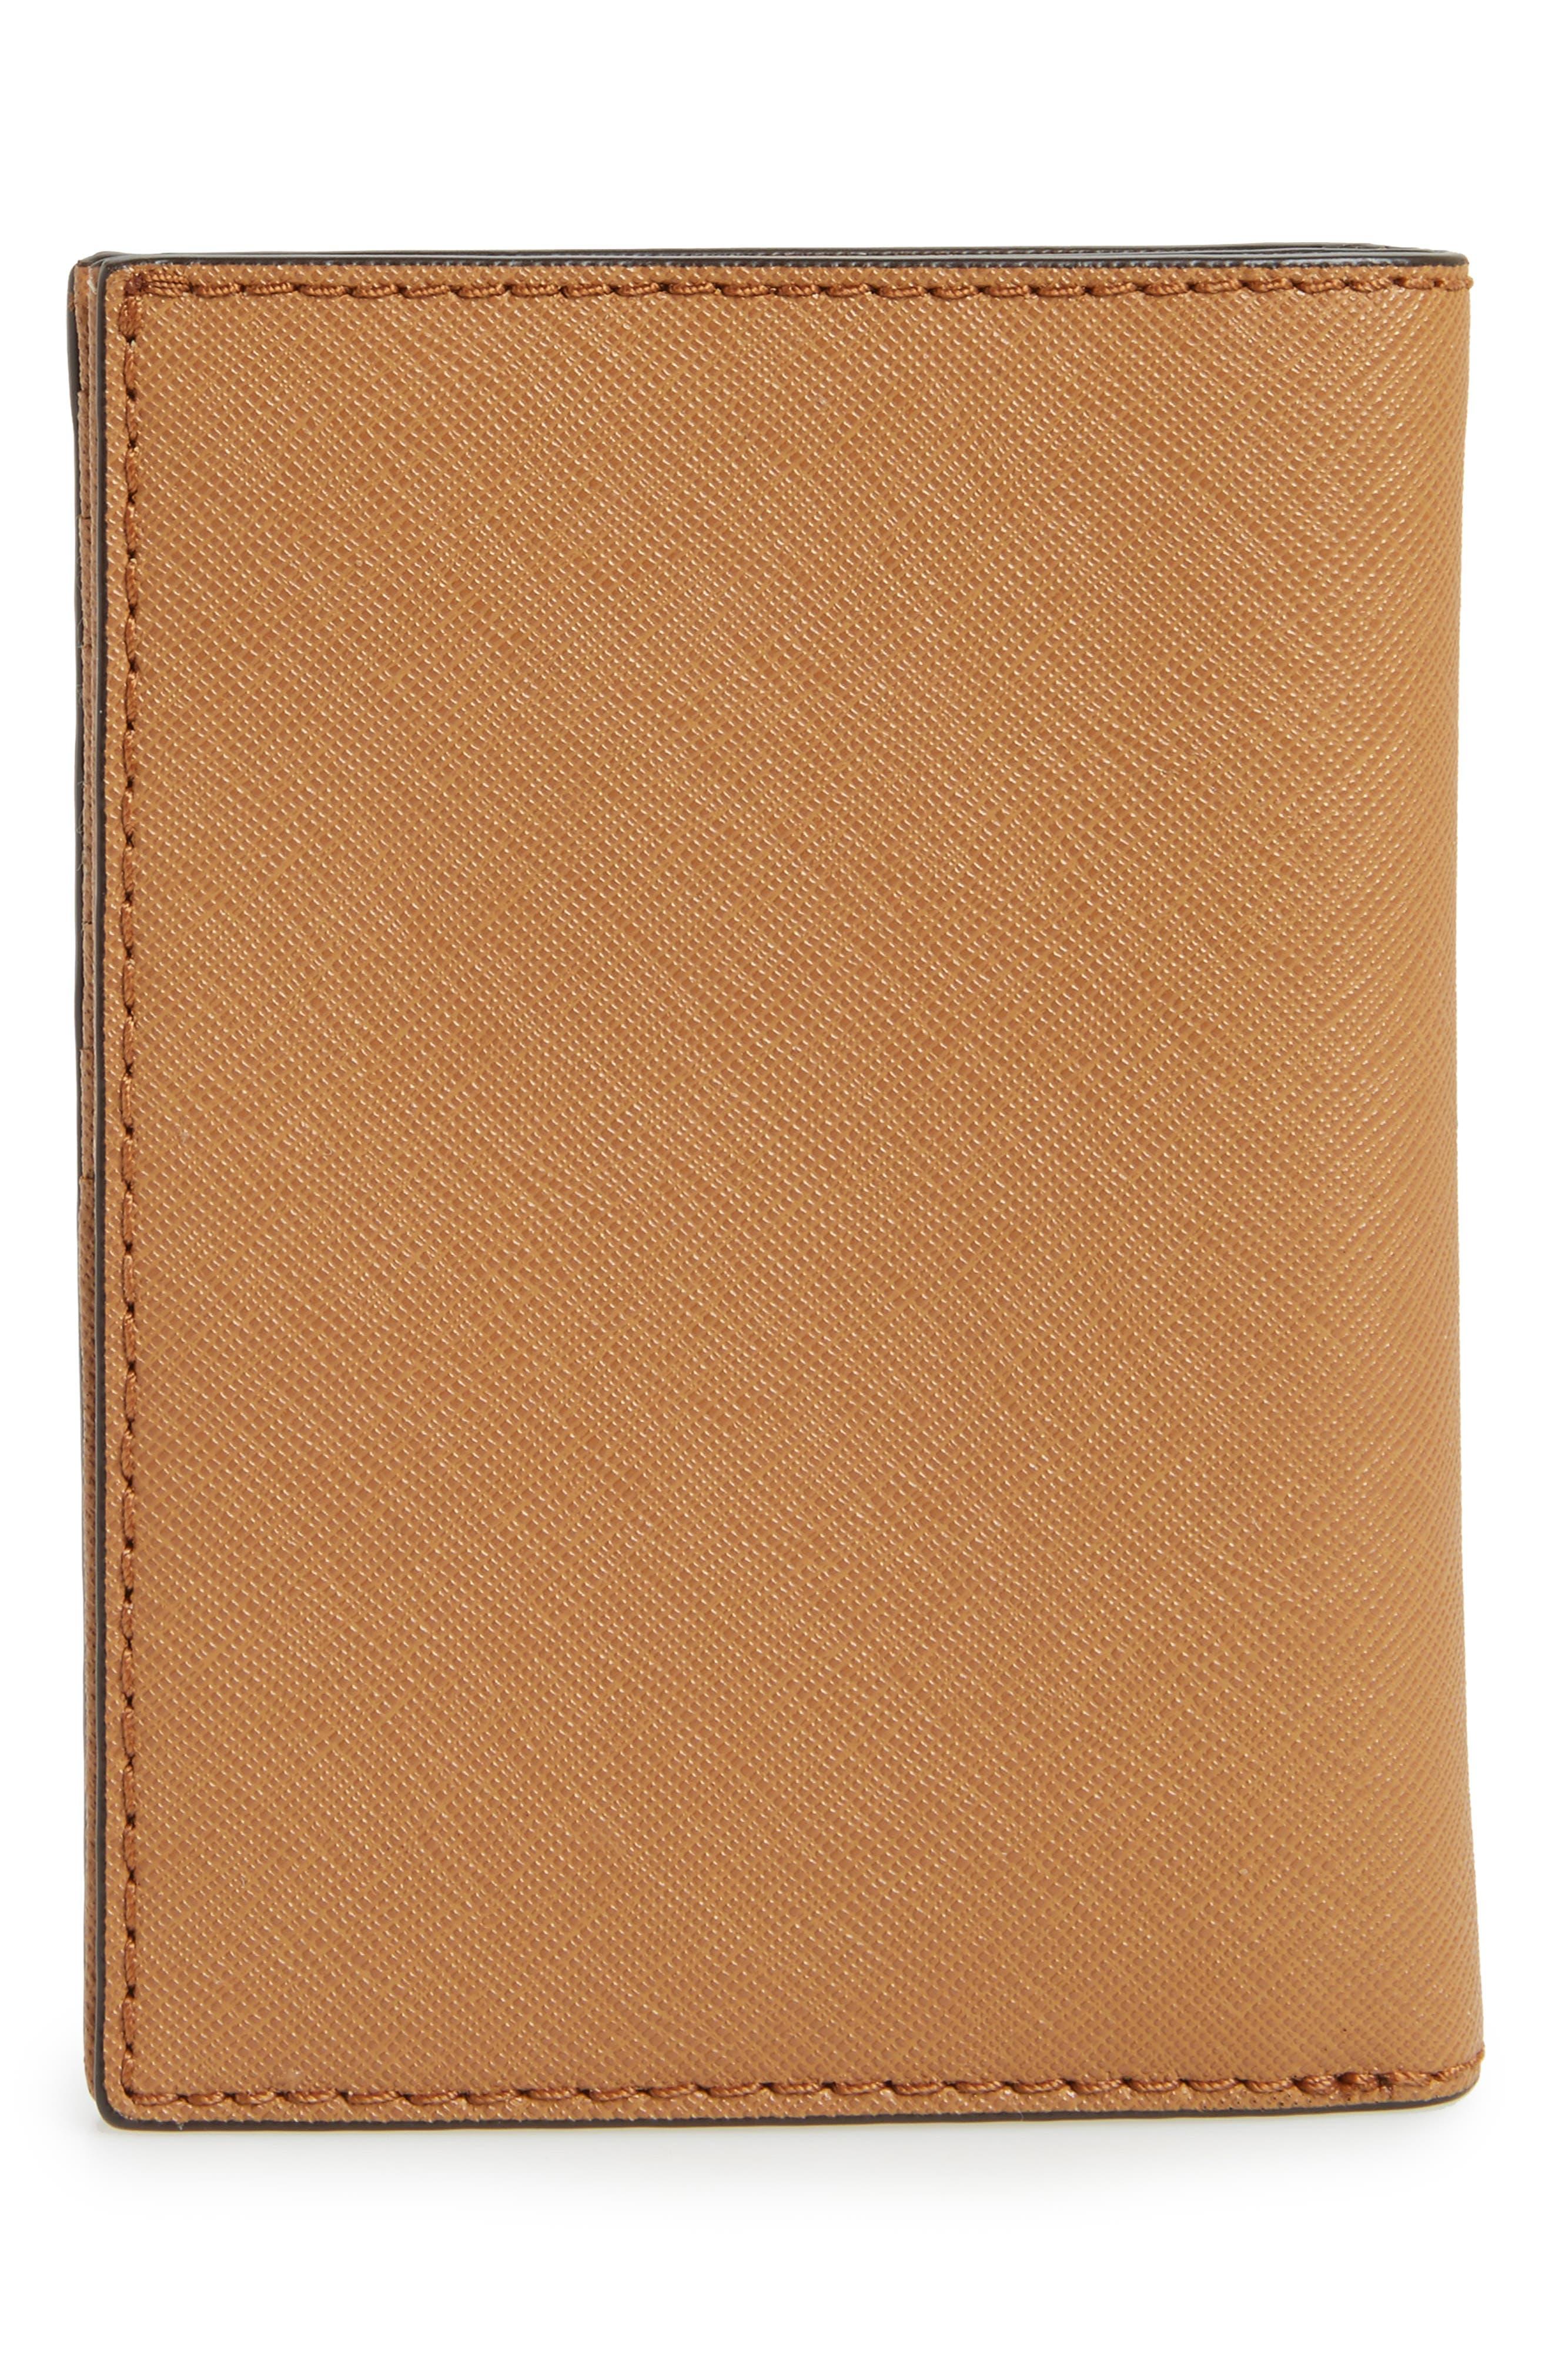 Alternate Image 3  - MICHAEL Michael Kors 'Jet Set' Leather Passport Wallet